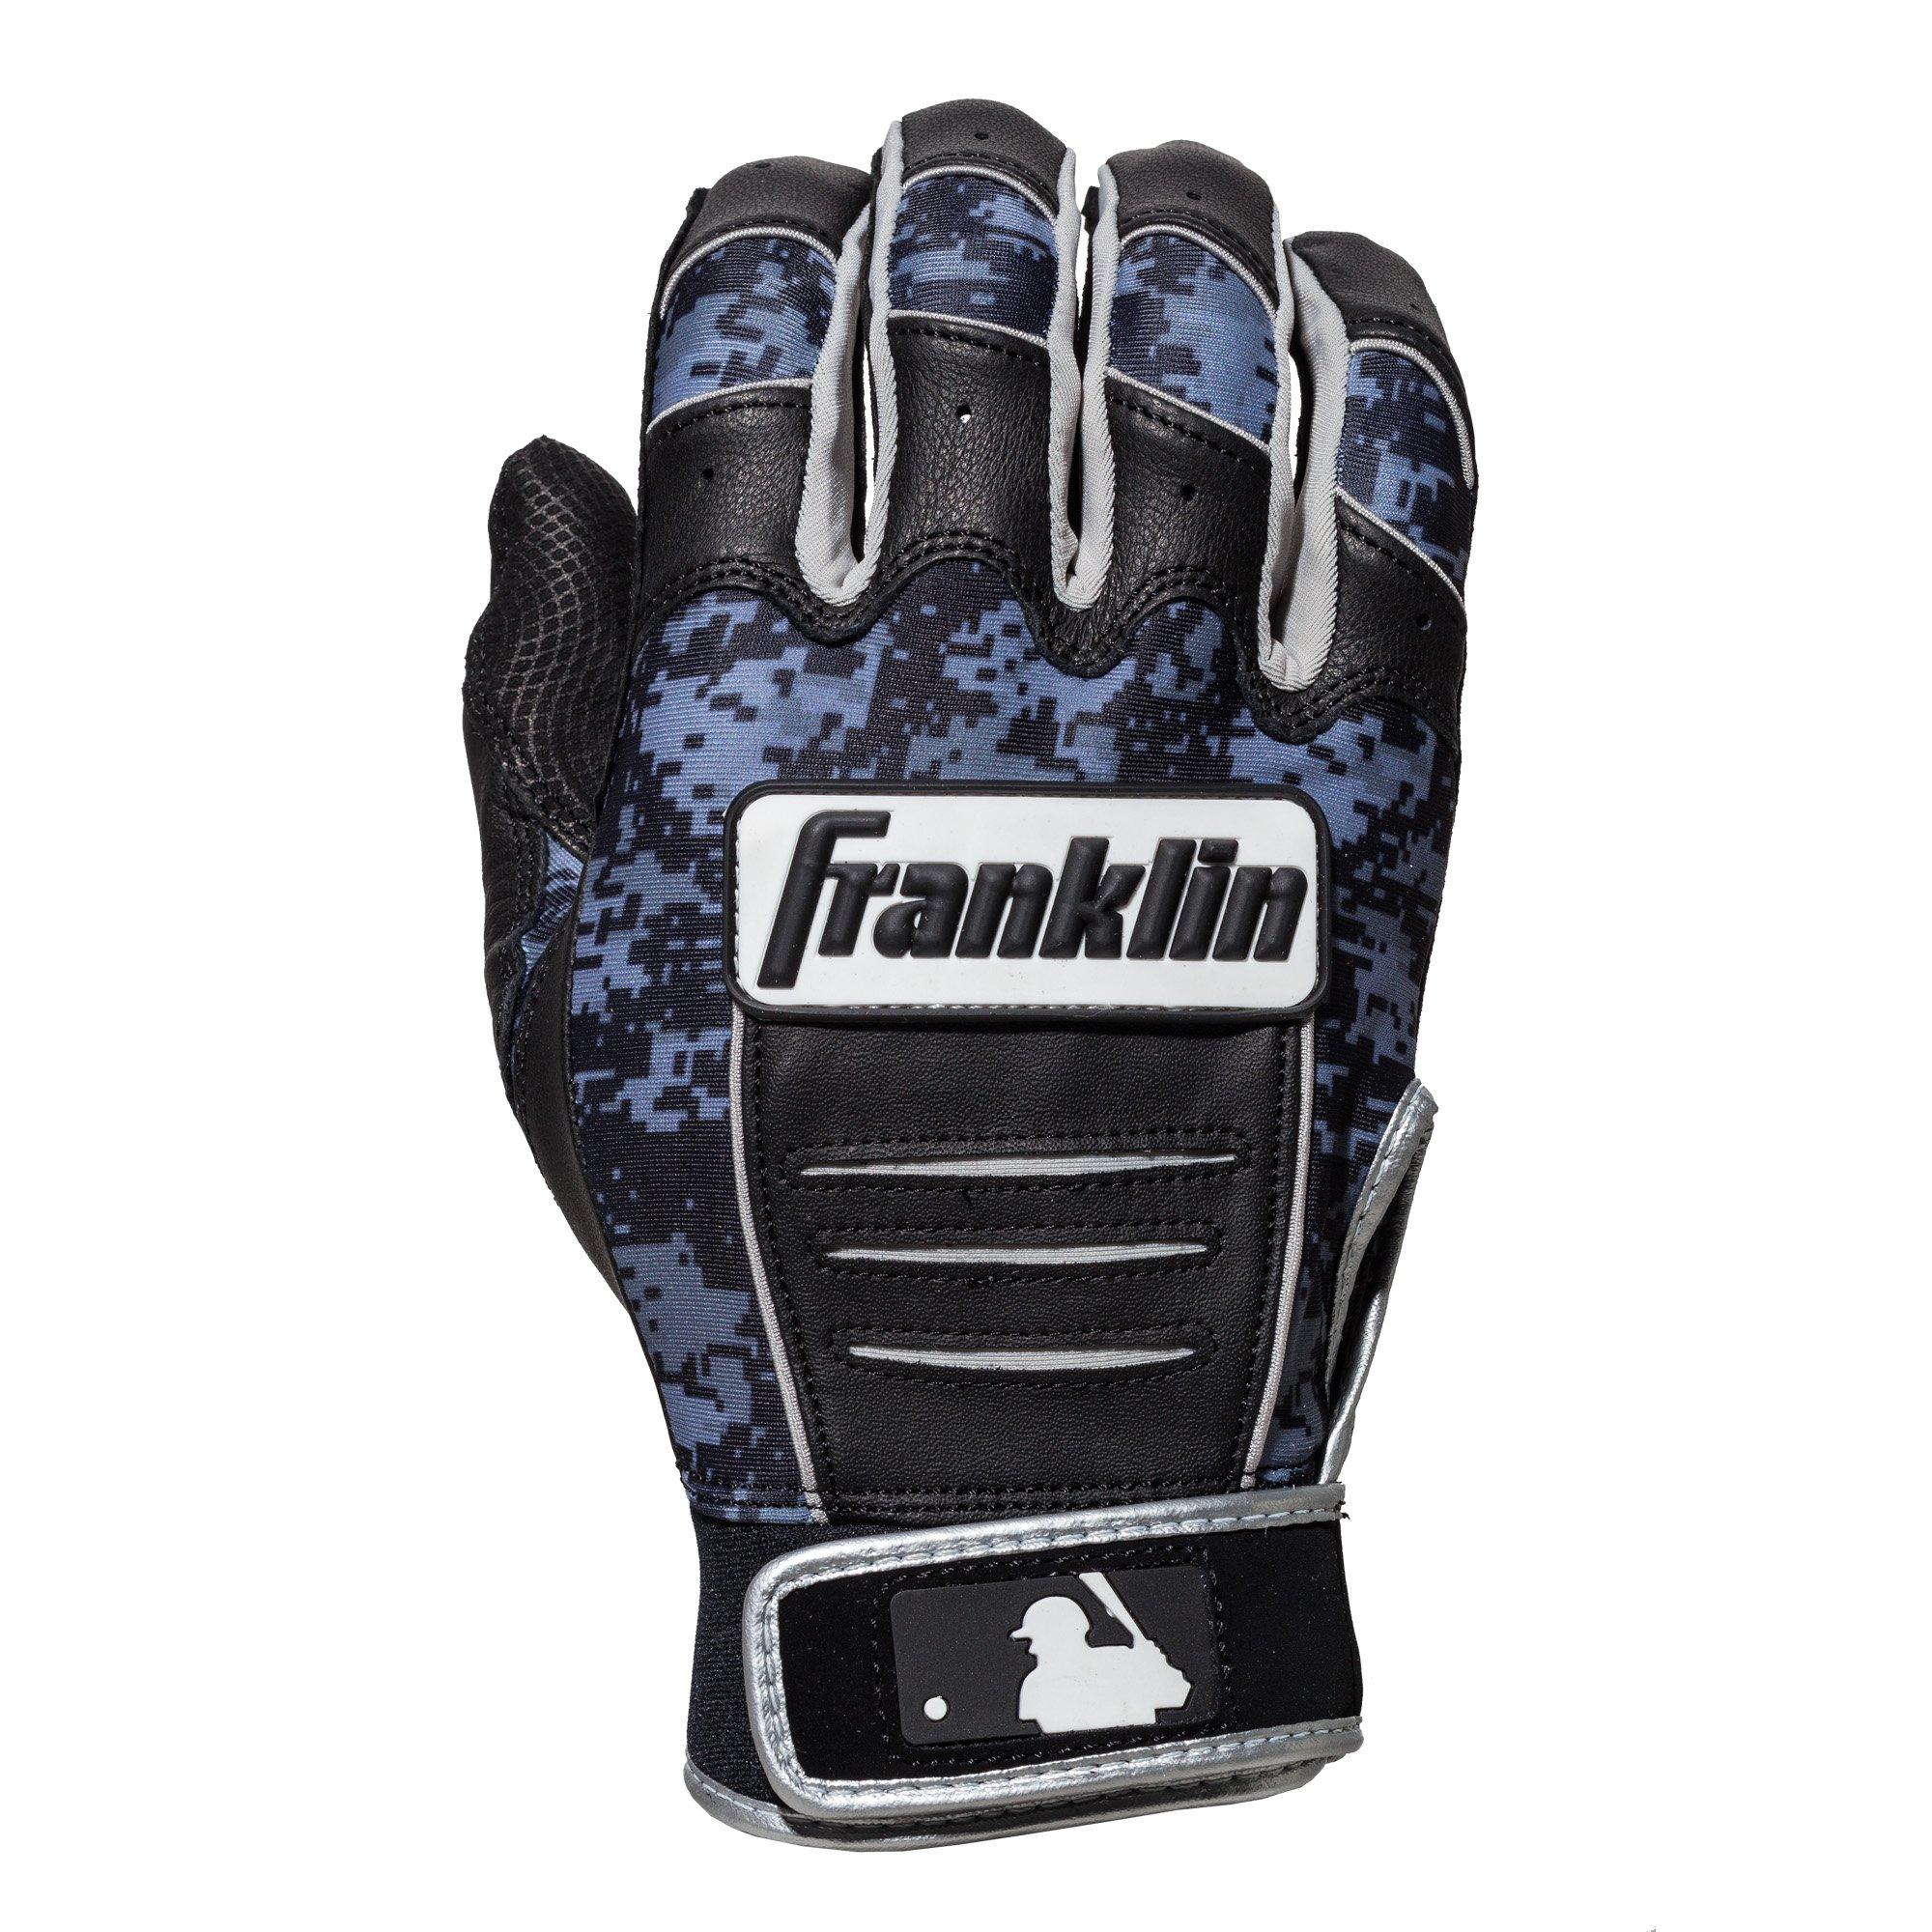 Franklin Sports CFX Pro Digi Series Batting Gloves Black/Black Camo Adult Small by Franklin Sports (Image #2)